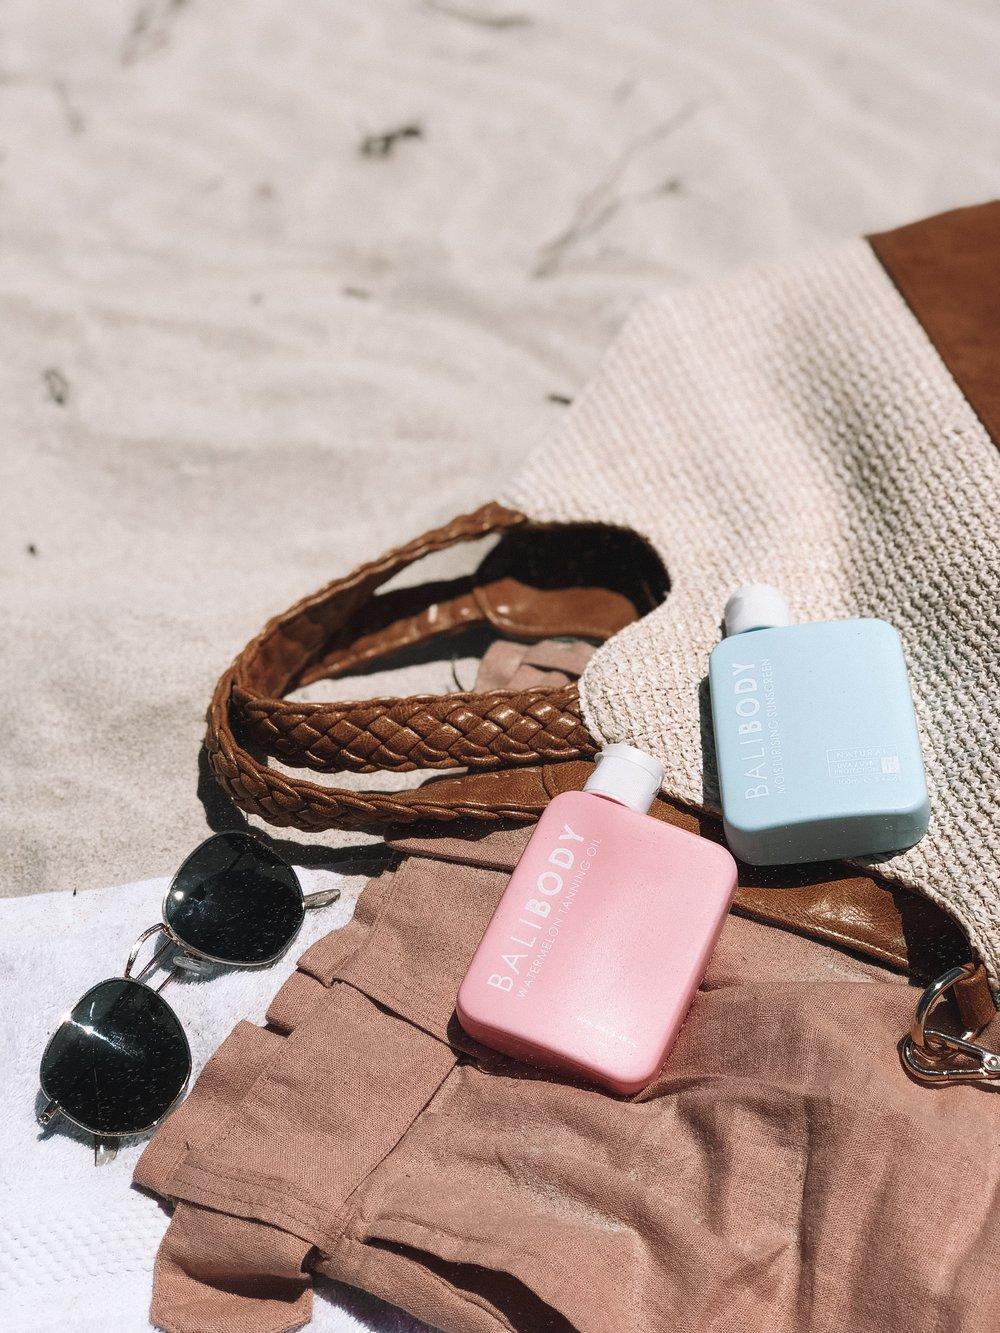 The Golden Traveller Bundle Review Bali Body Izzy Wears